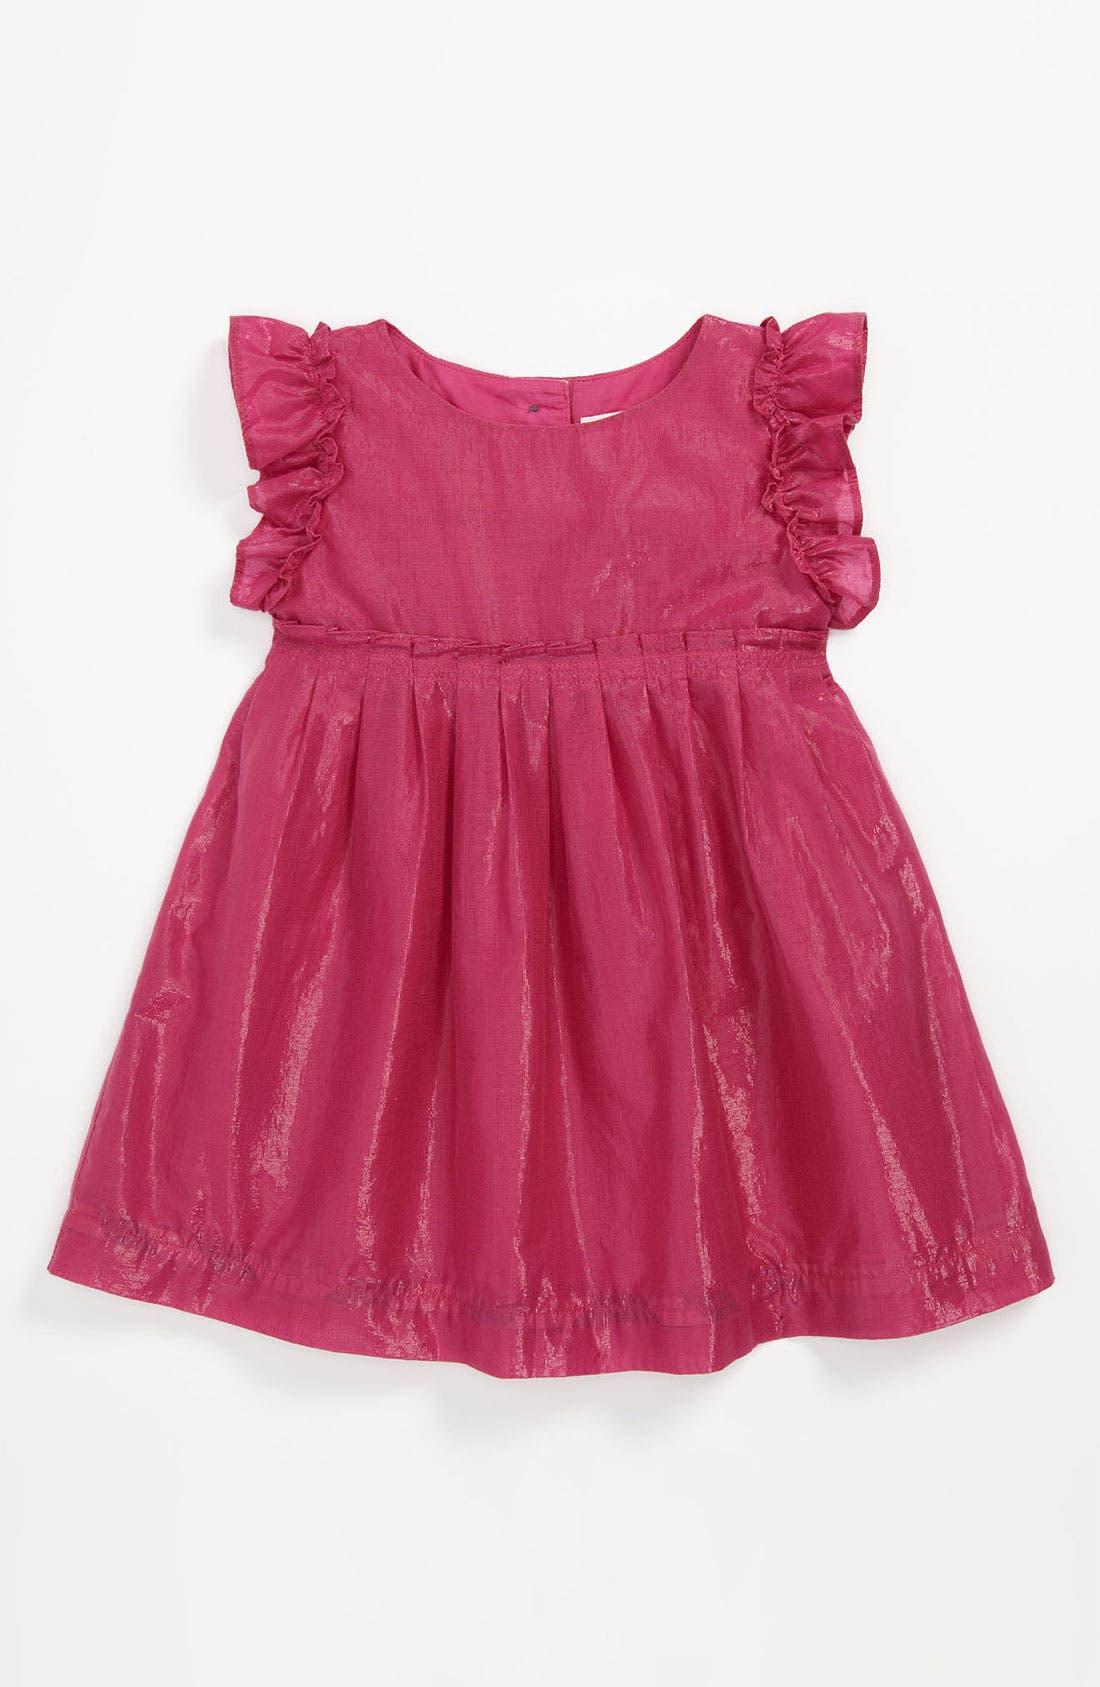 Main Image - Burberry 'Nadia' Dress (Baby)